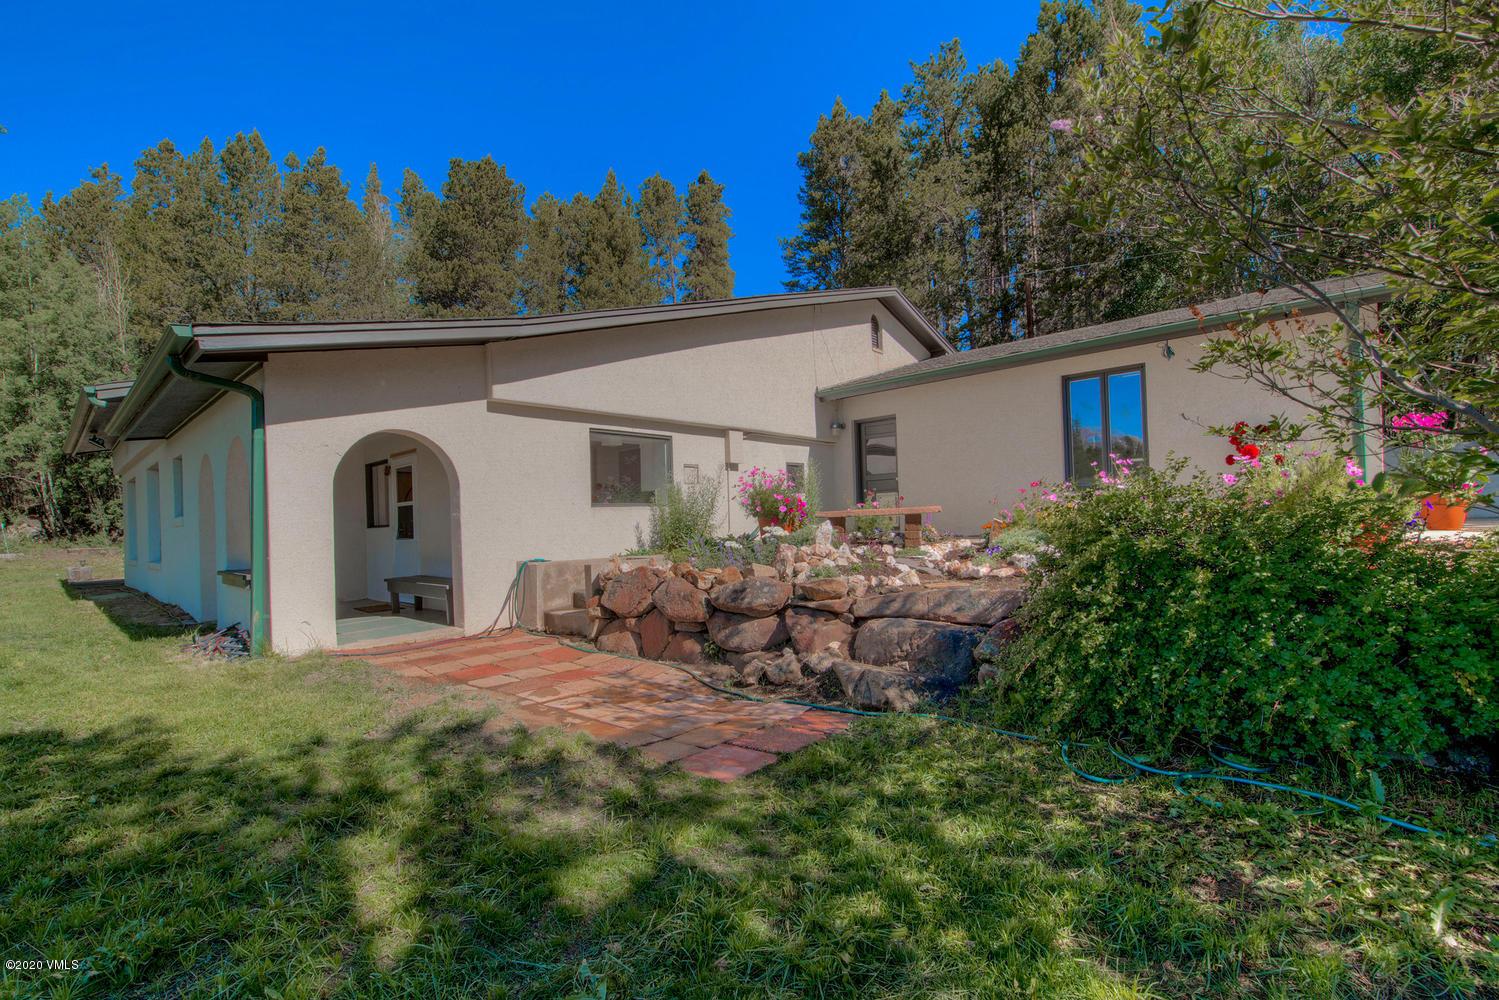 3128 Soda Springs, Leadville, Co 80461 Property Photo